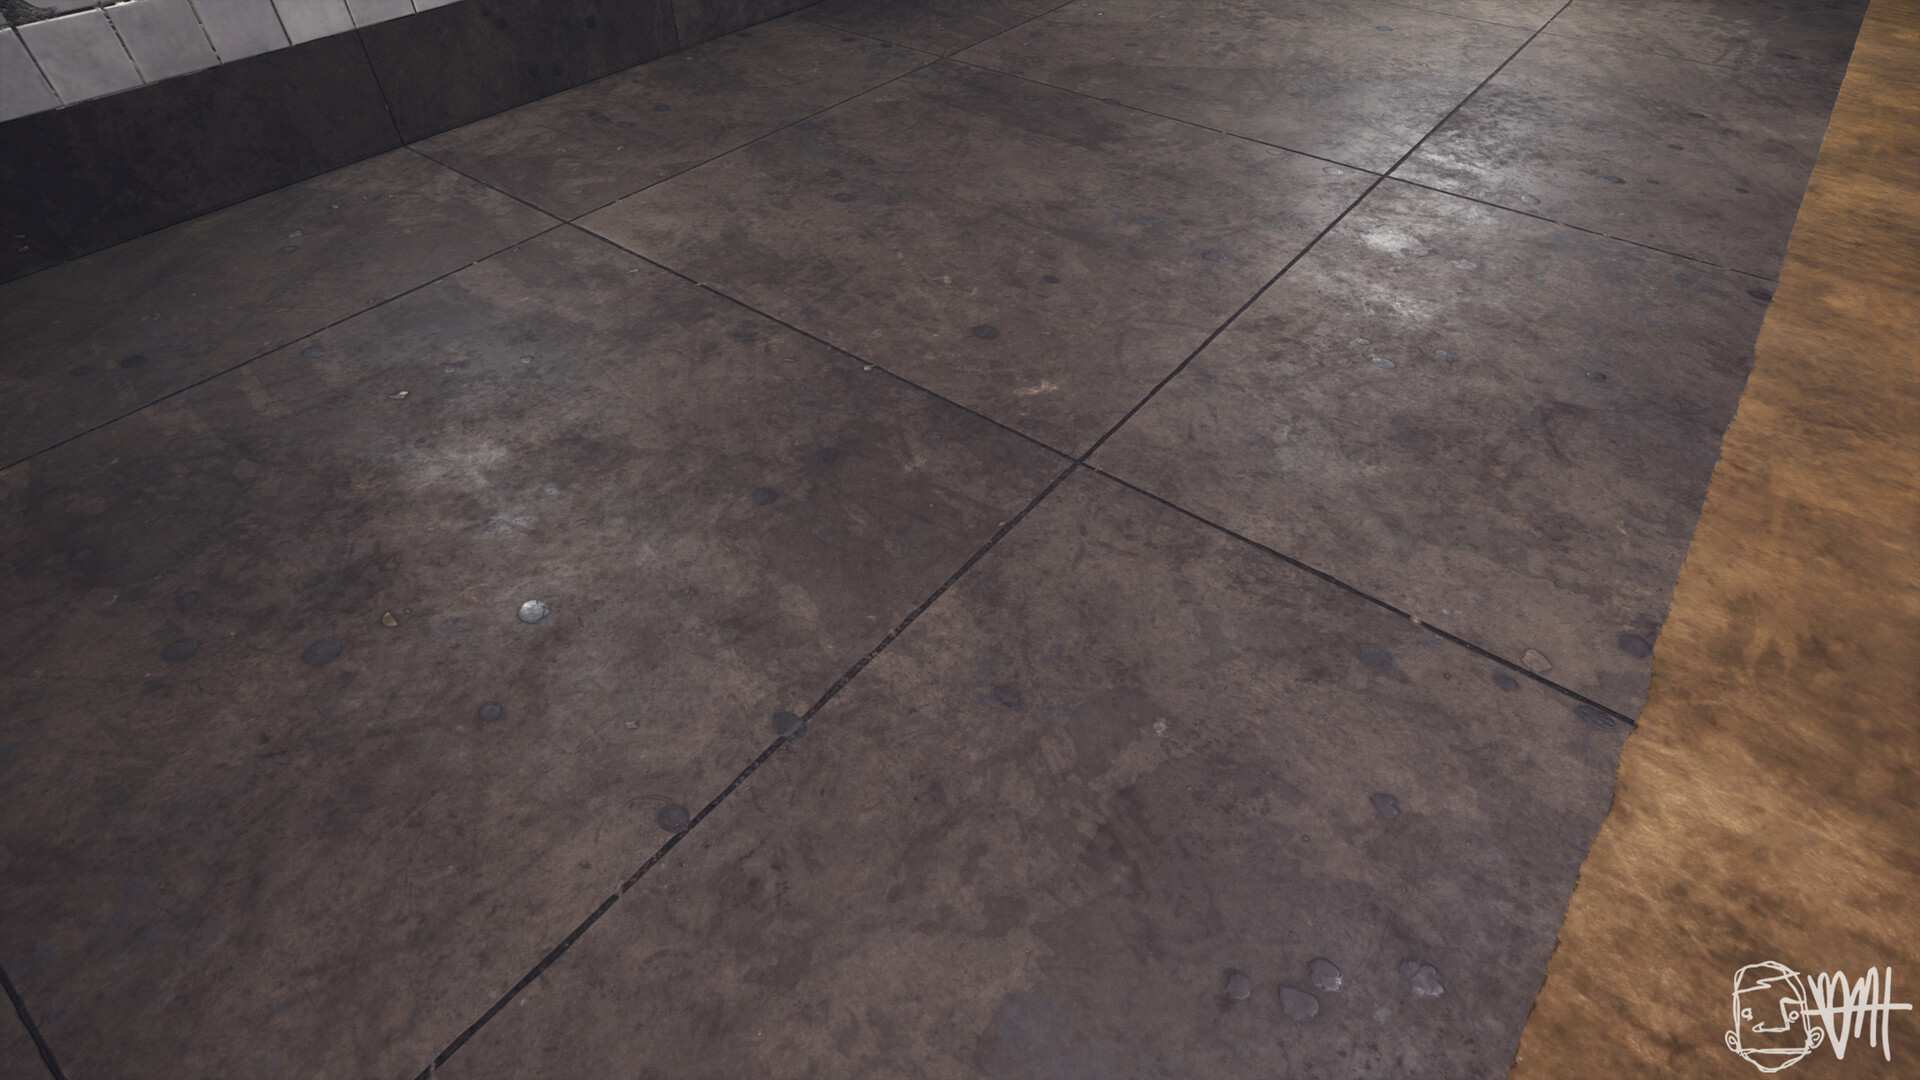 Brett marshall tucker subway concrete shot 1